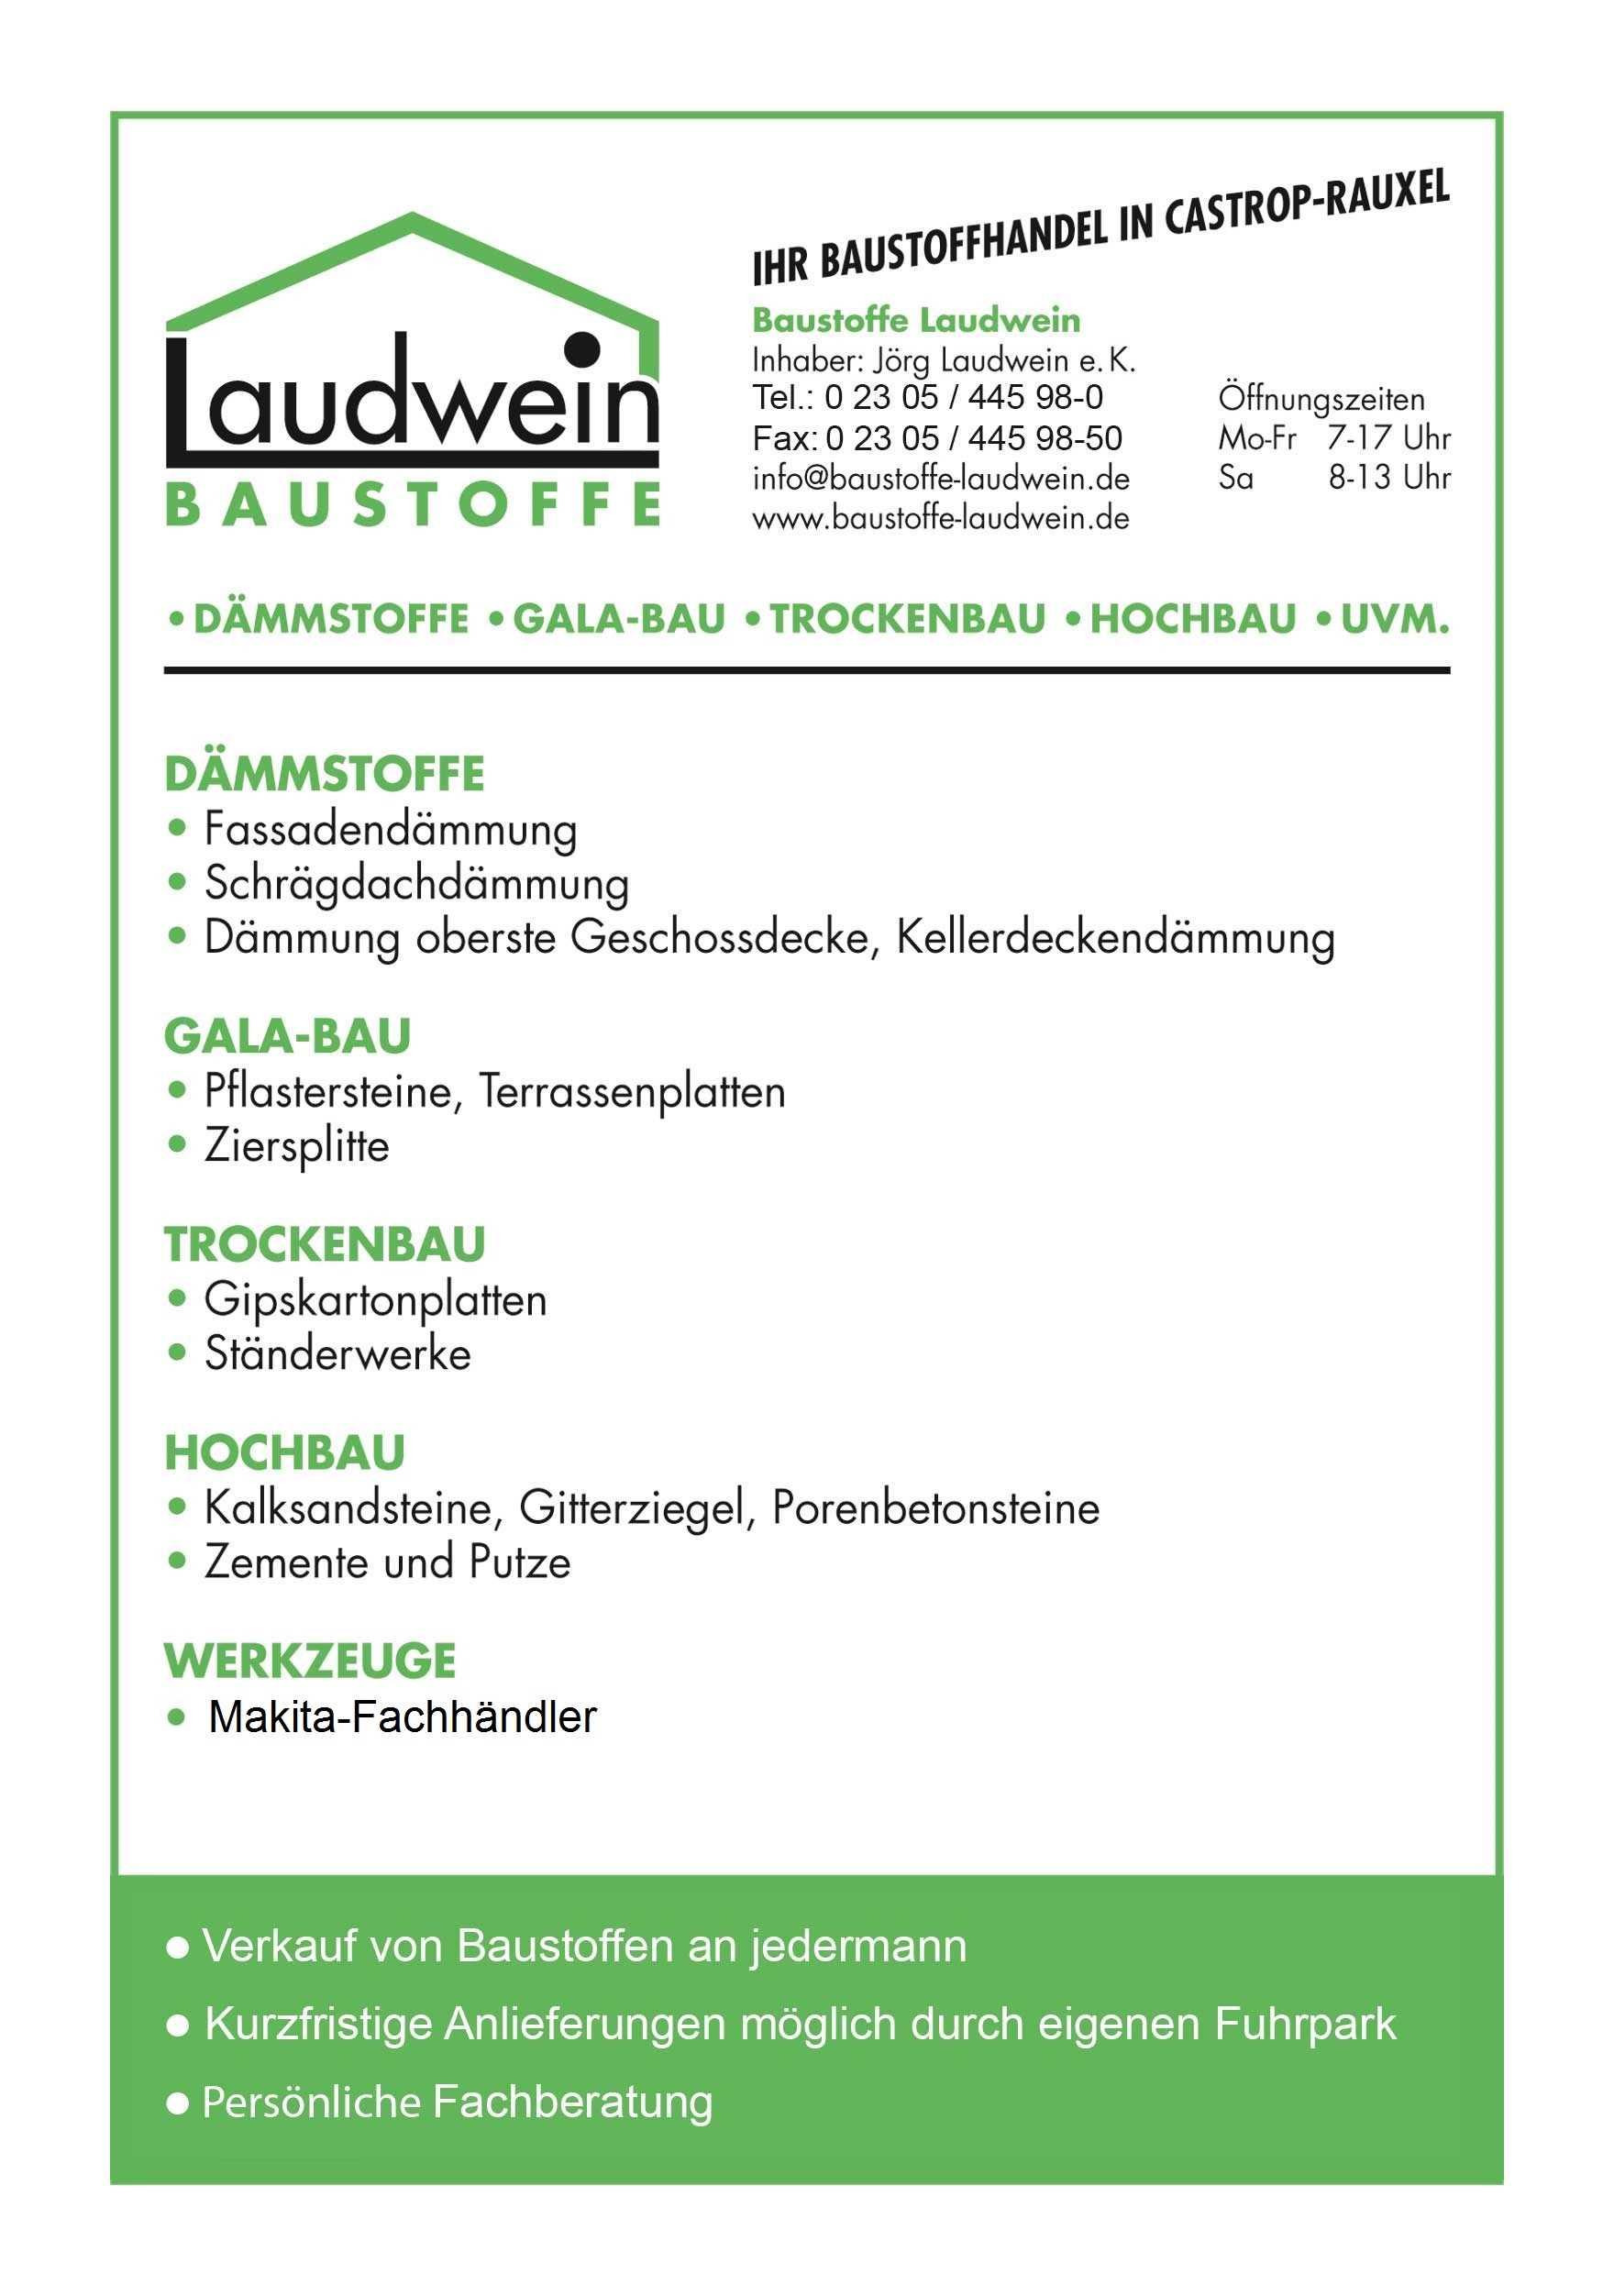 Laudwein - Baustoffe